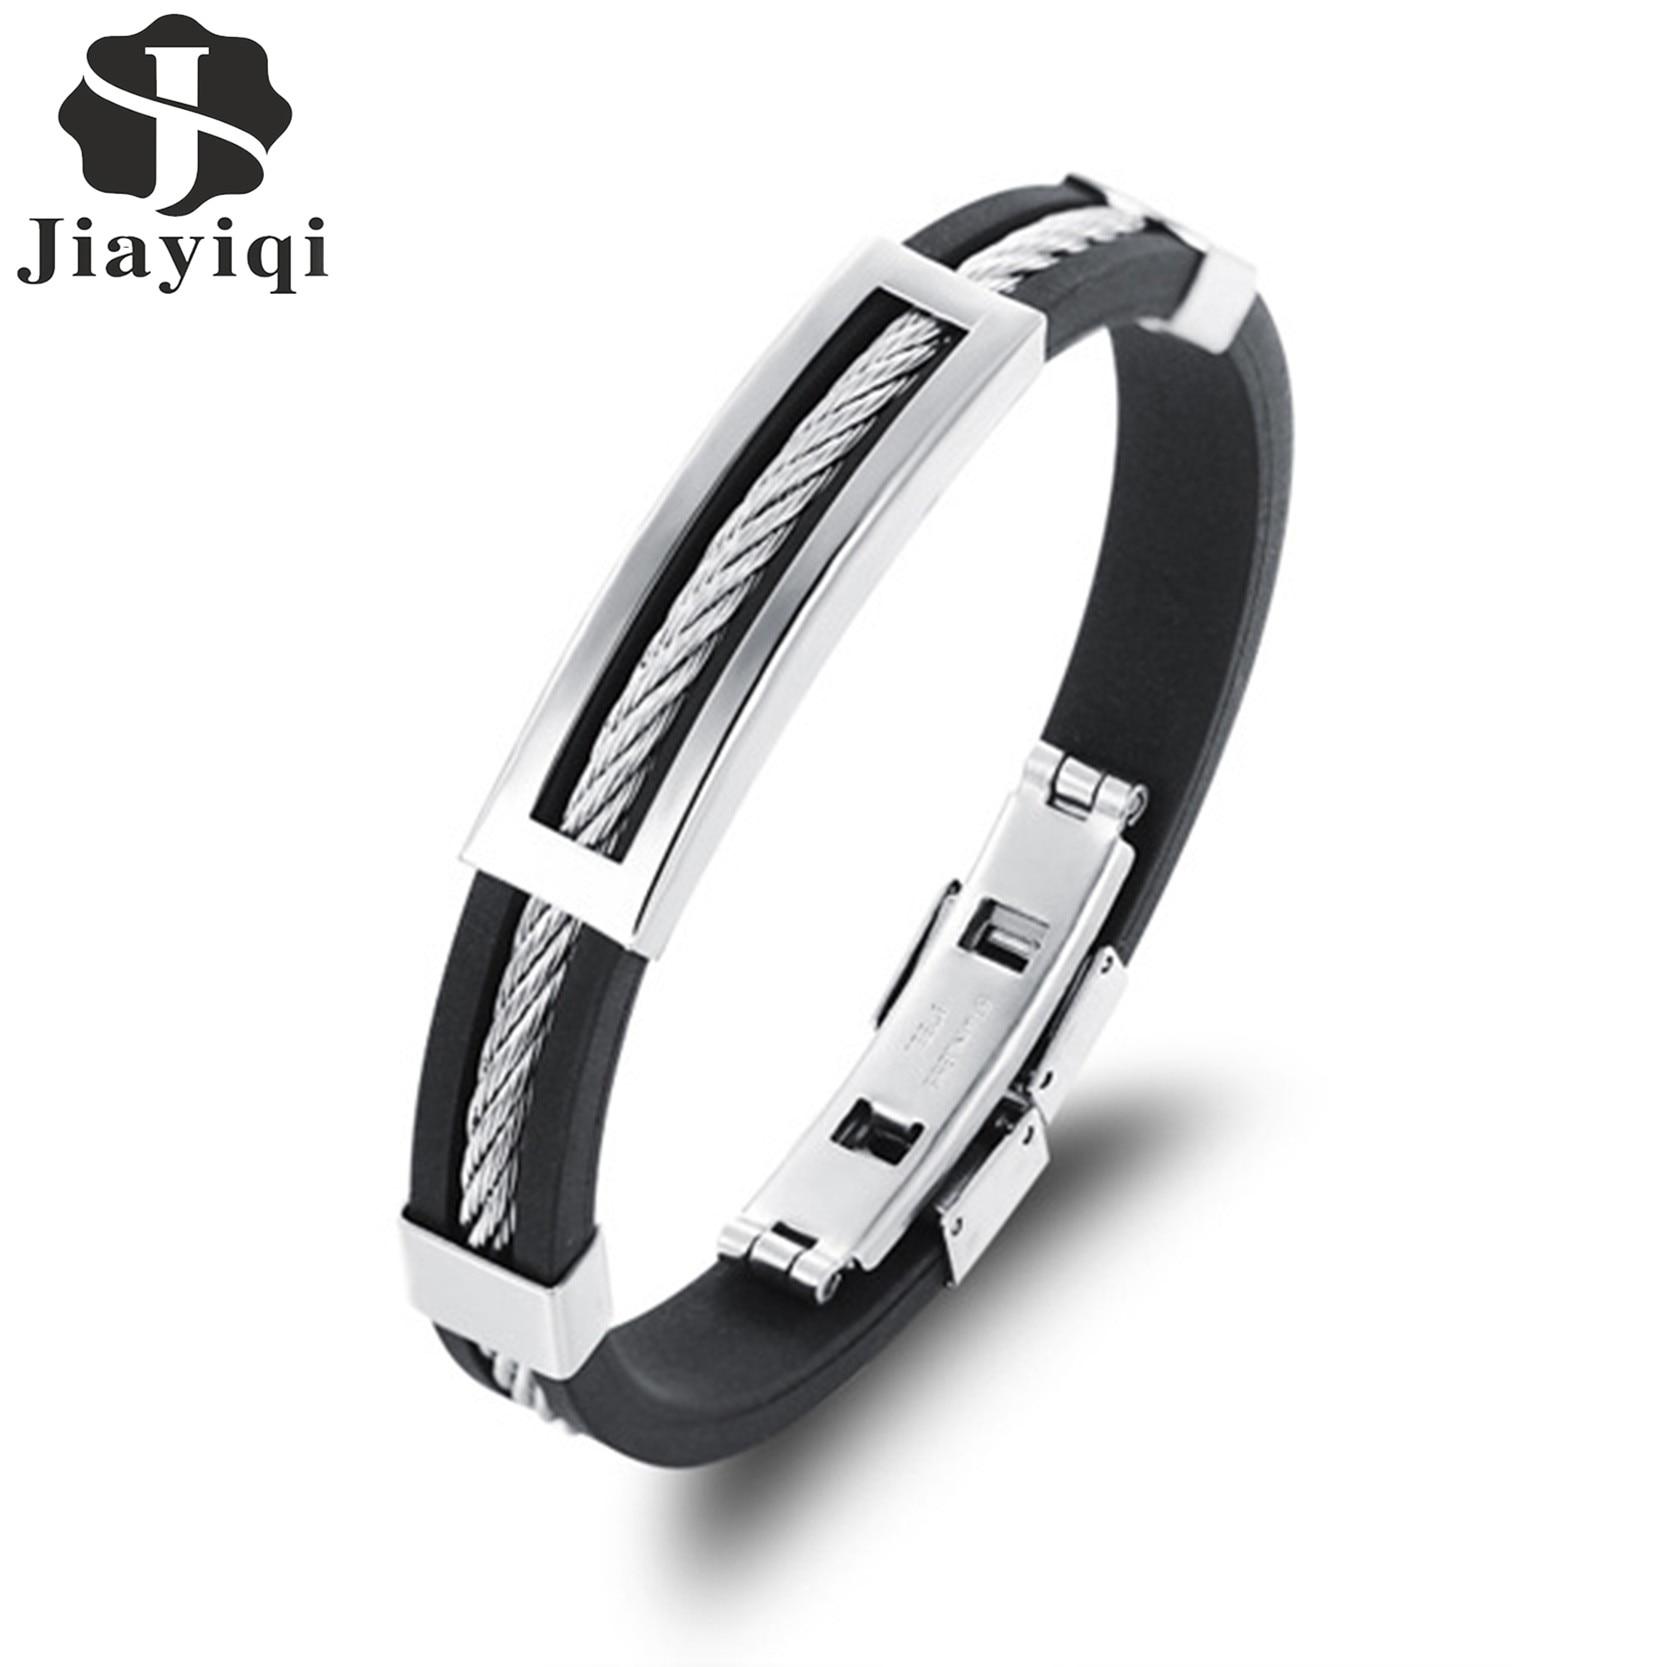 Jiayiqi New Mens Bracelets Stainless Steel Black Silicone Bracelets Charm Bracelet Male Bangle For Men Jewelry 2017 Silver Color